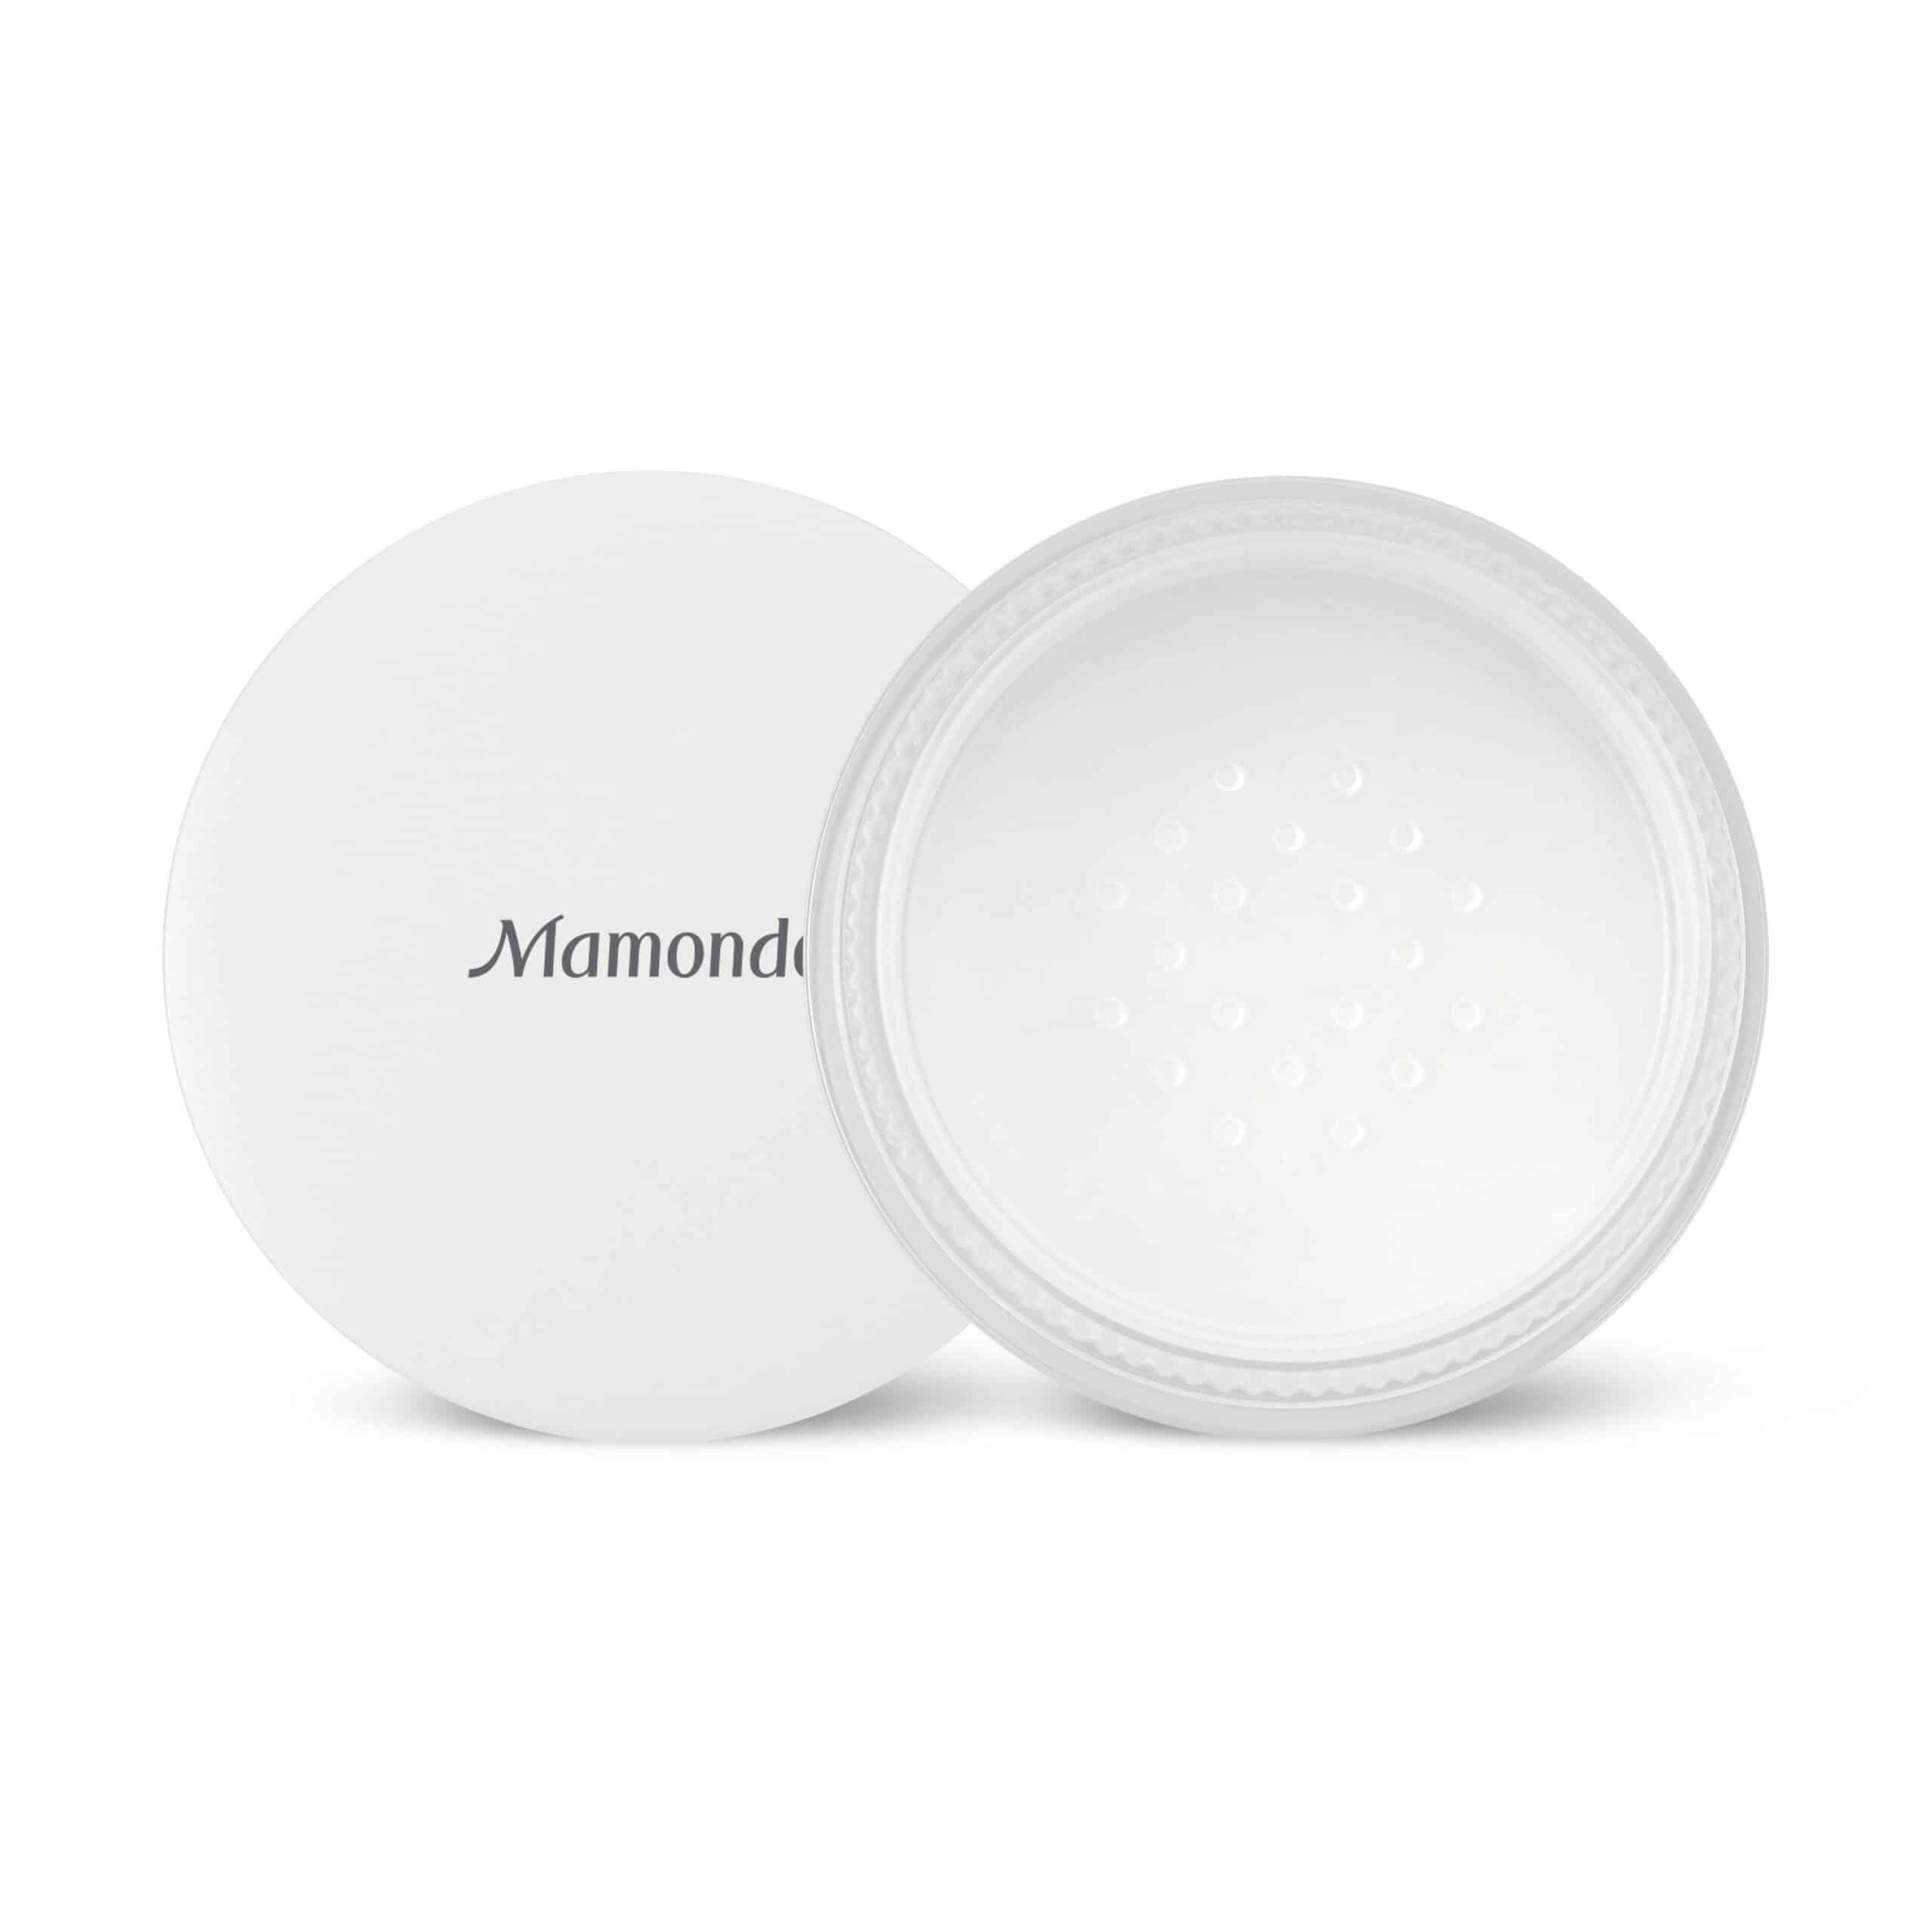 Mamonde-Cotton-Veil-Powder-scaled